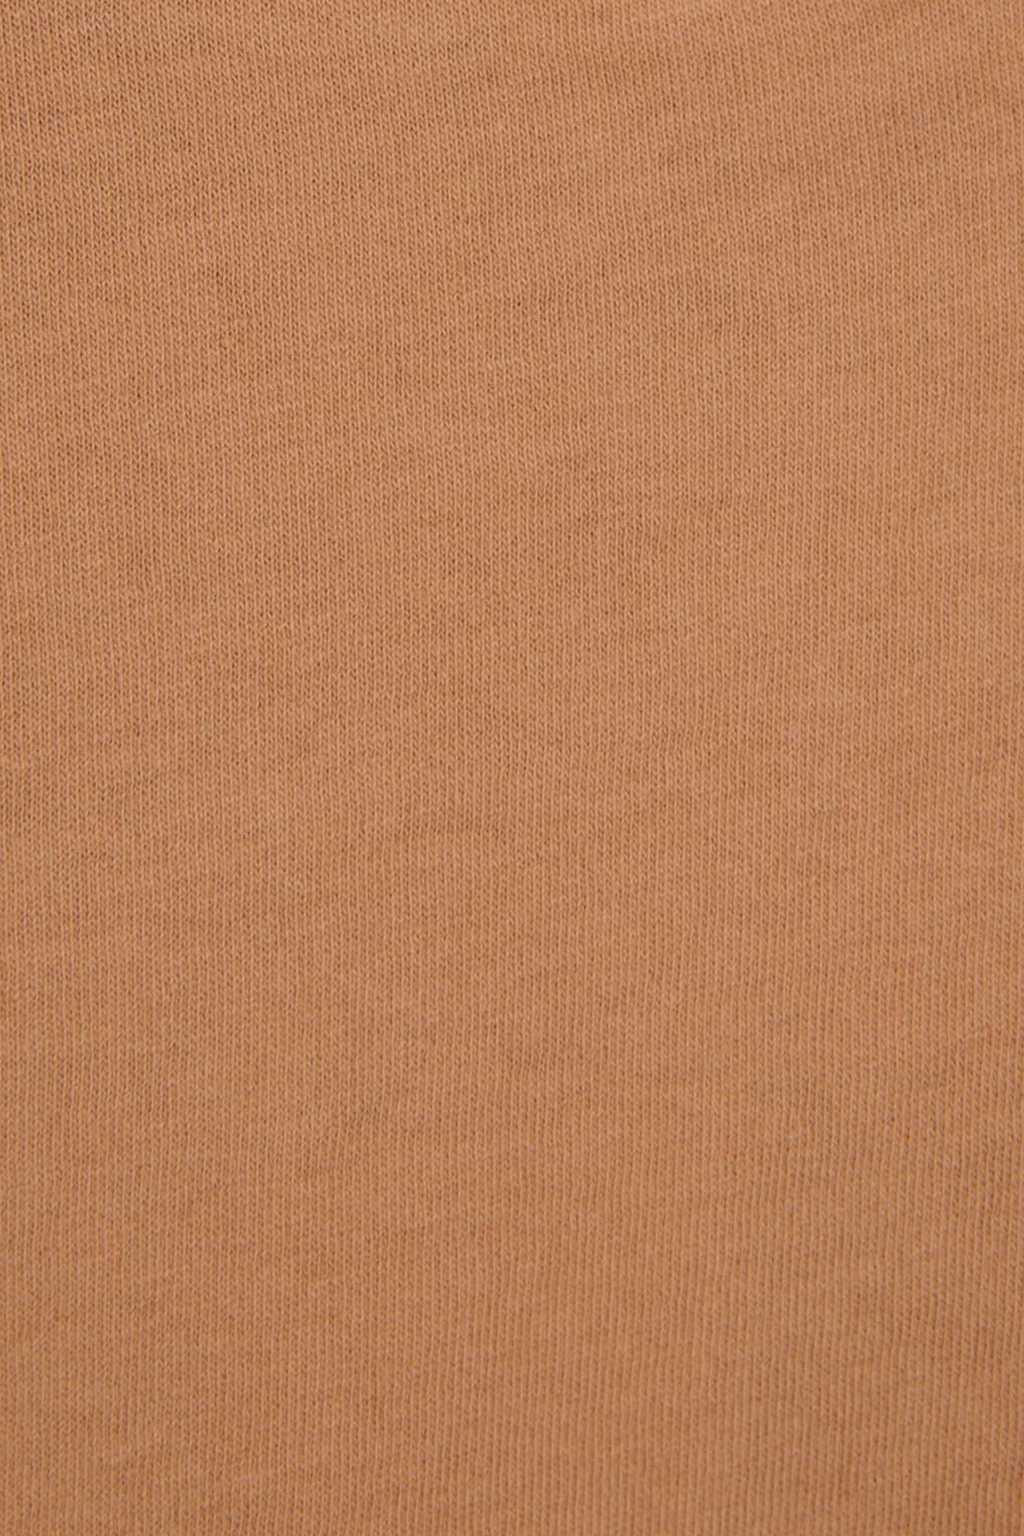 TShirt H318 Brown 6